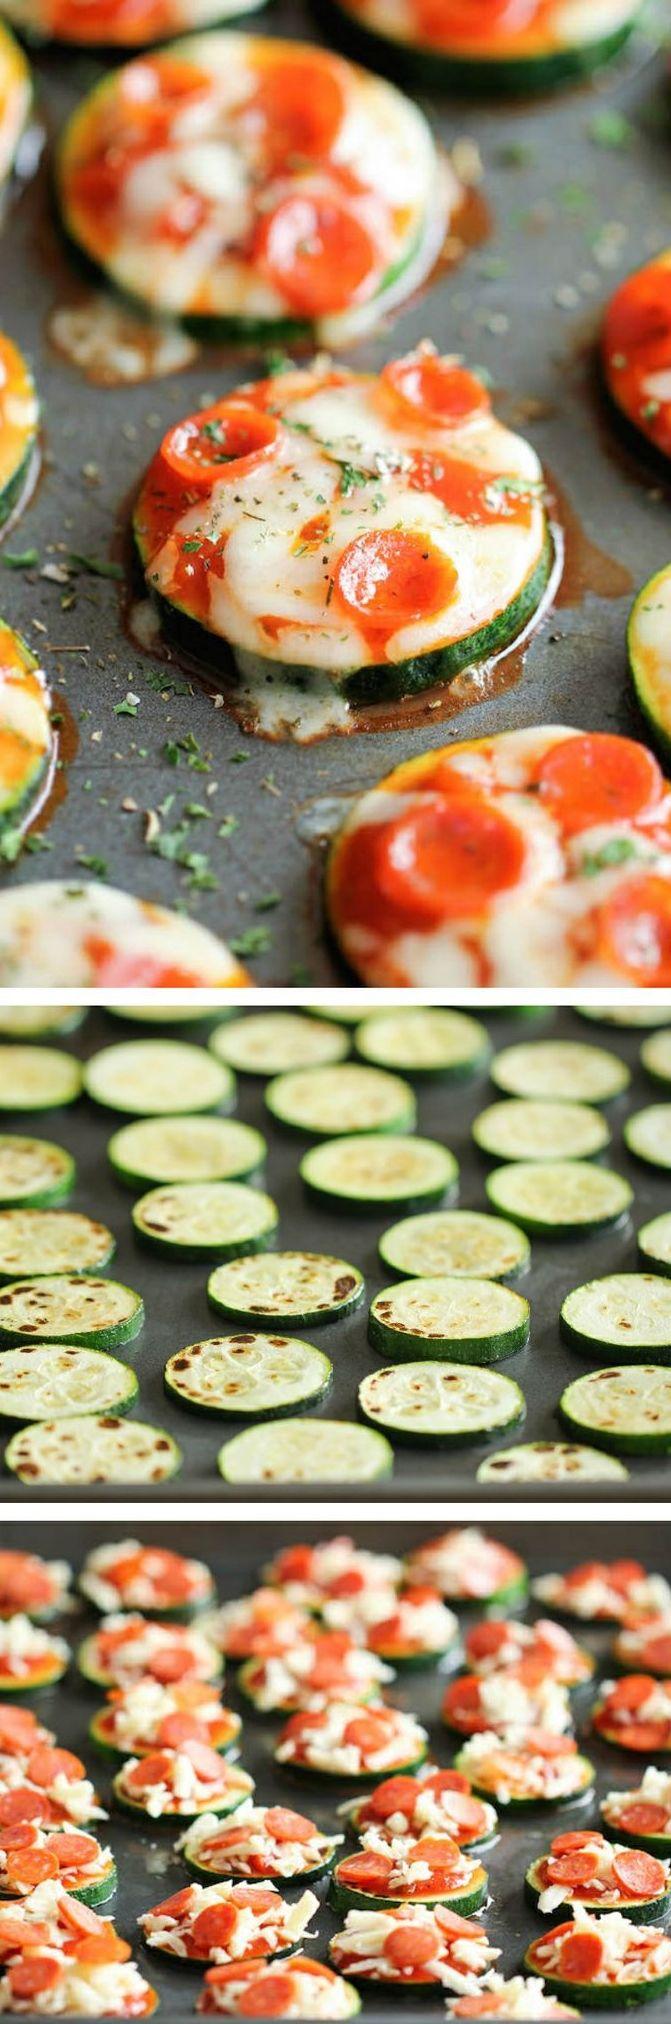 Zucchini Pizza Bites - Healthy, nutritious pizza bites that come ...